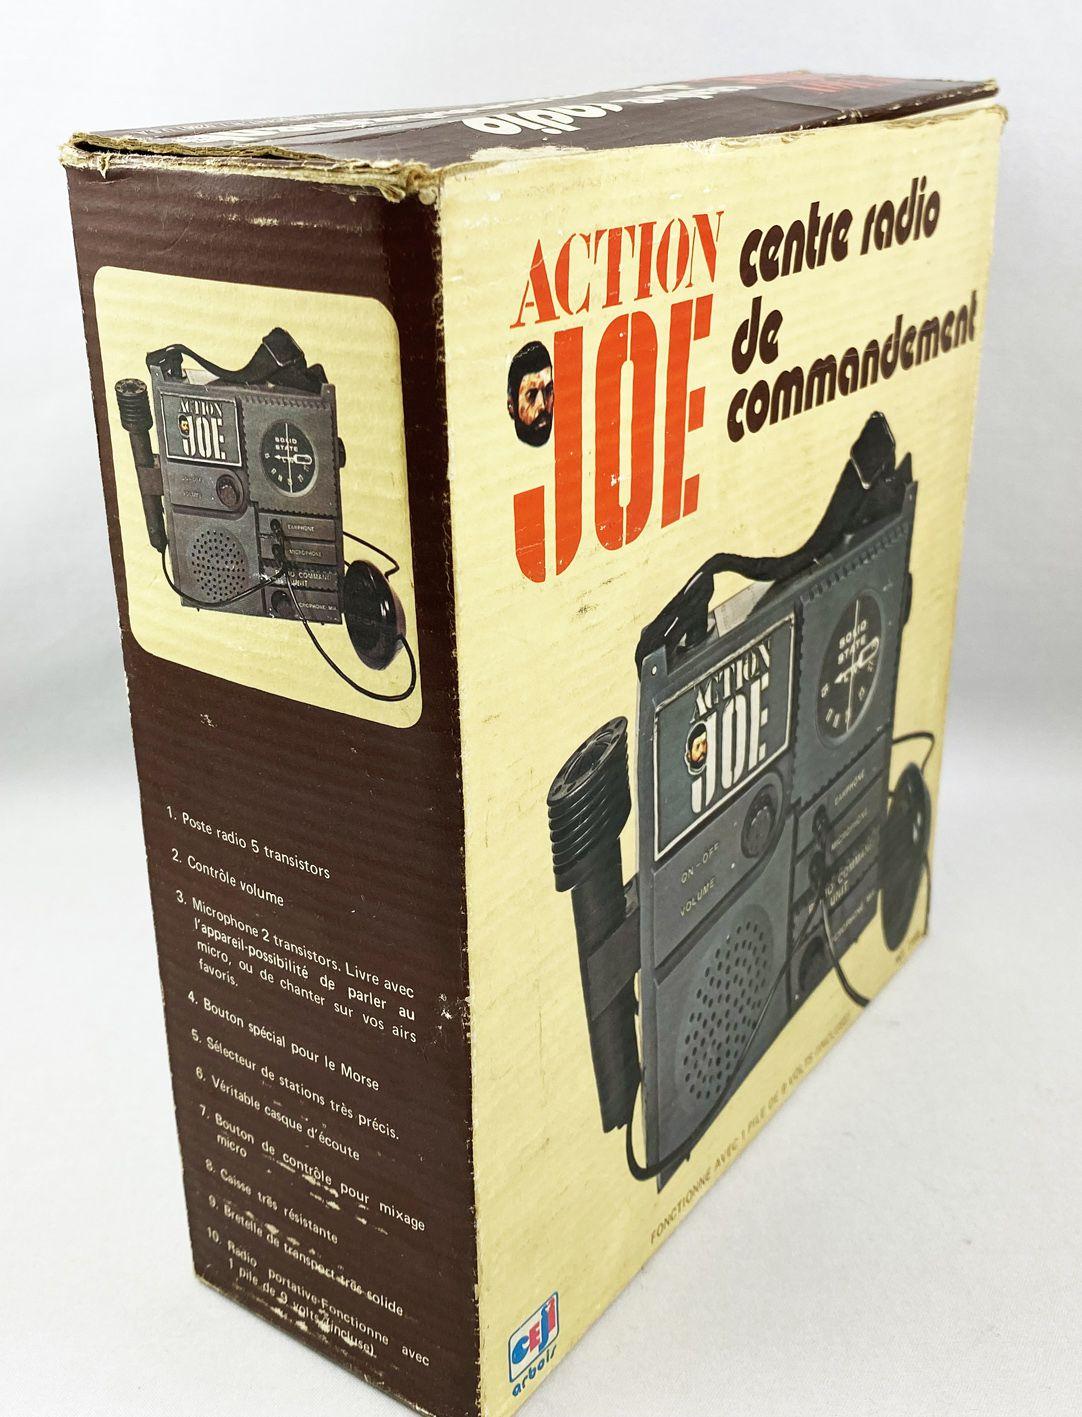 Action Joe - Centre Radio de Commandement - Ref.7518